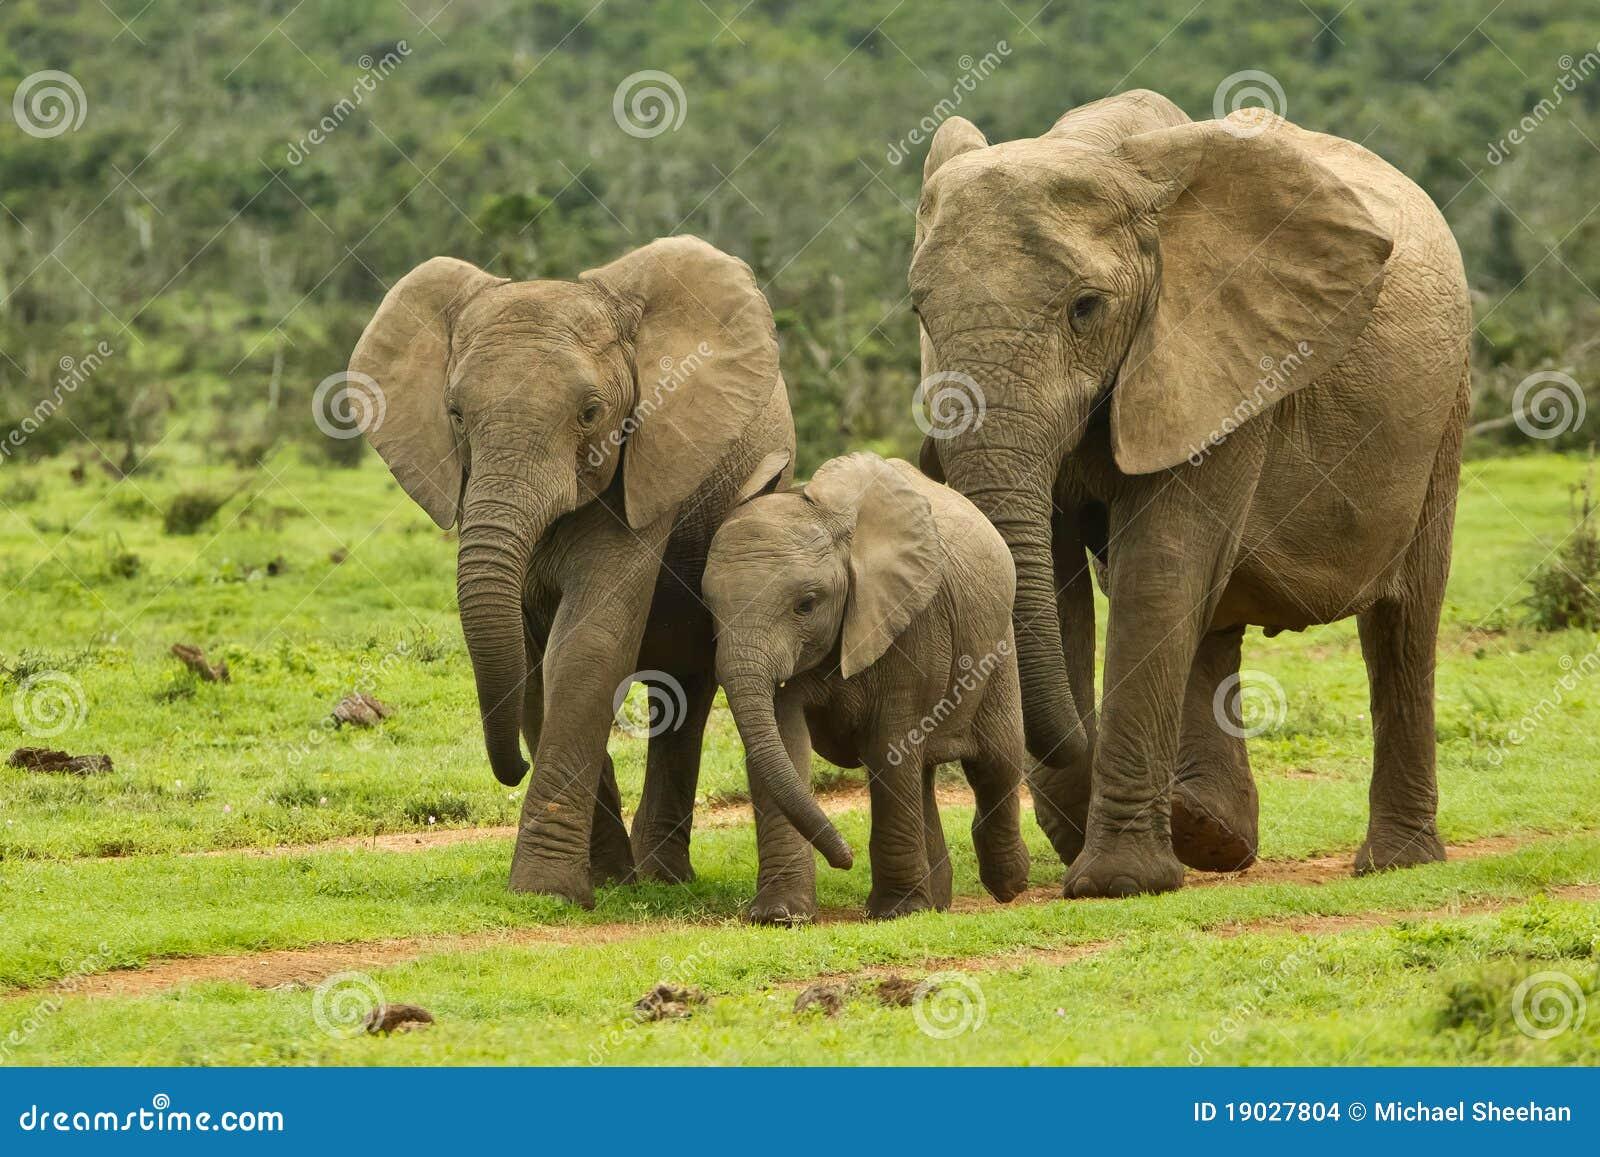 elephant-family-19027804.jpg